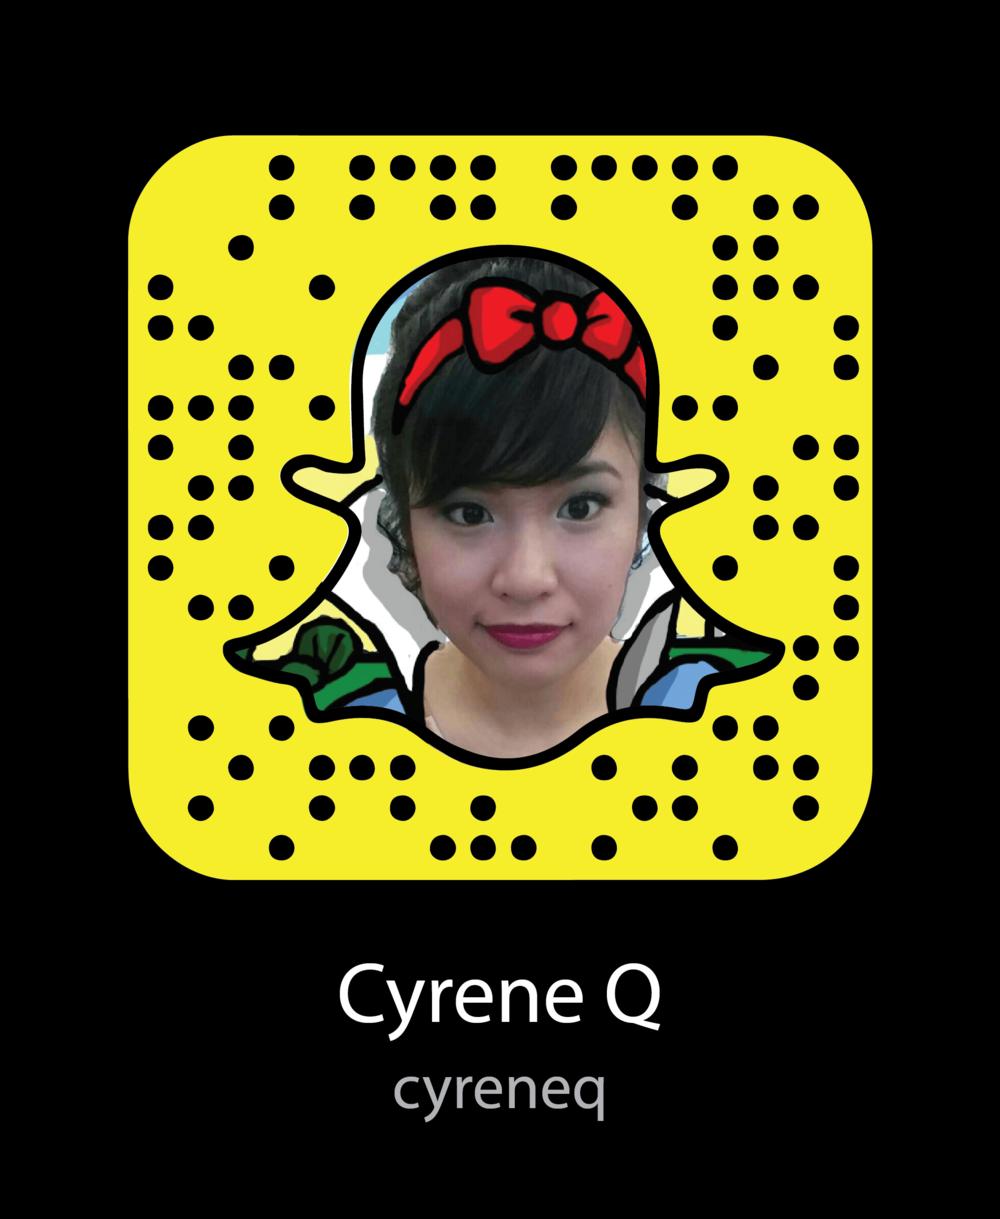 cyrene-q-artists-snapchat-snapcode